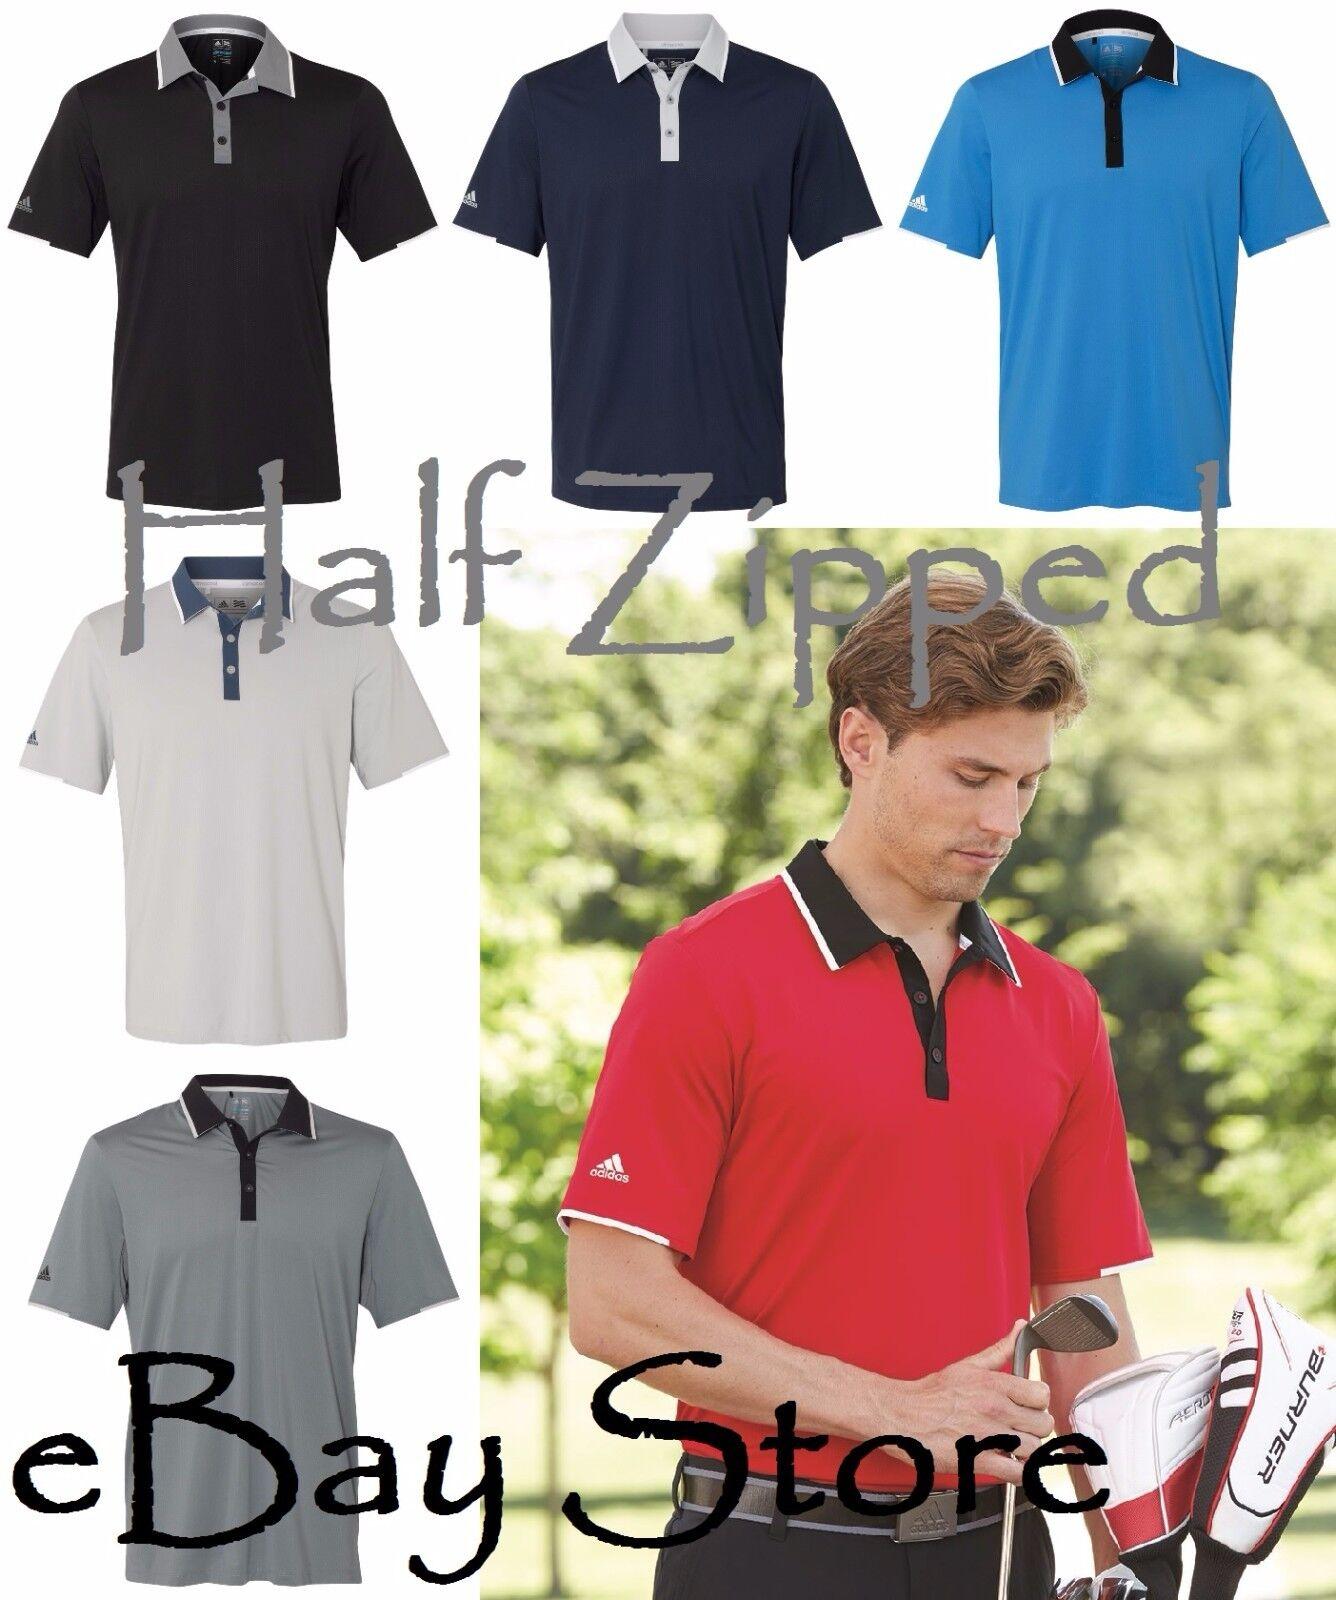 980f1f1a Adidas Mens Climacool Performance Polo Golf Sport Shirt A166 S-3XL